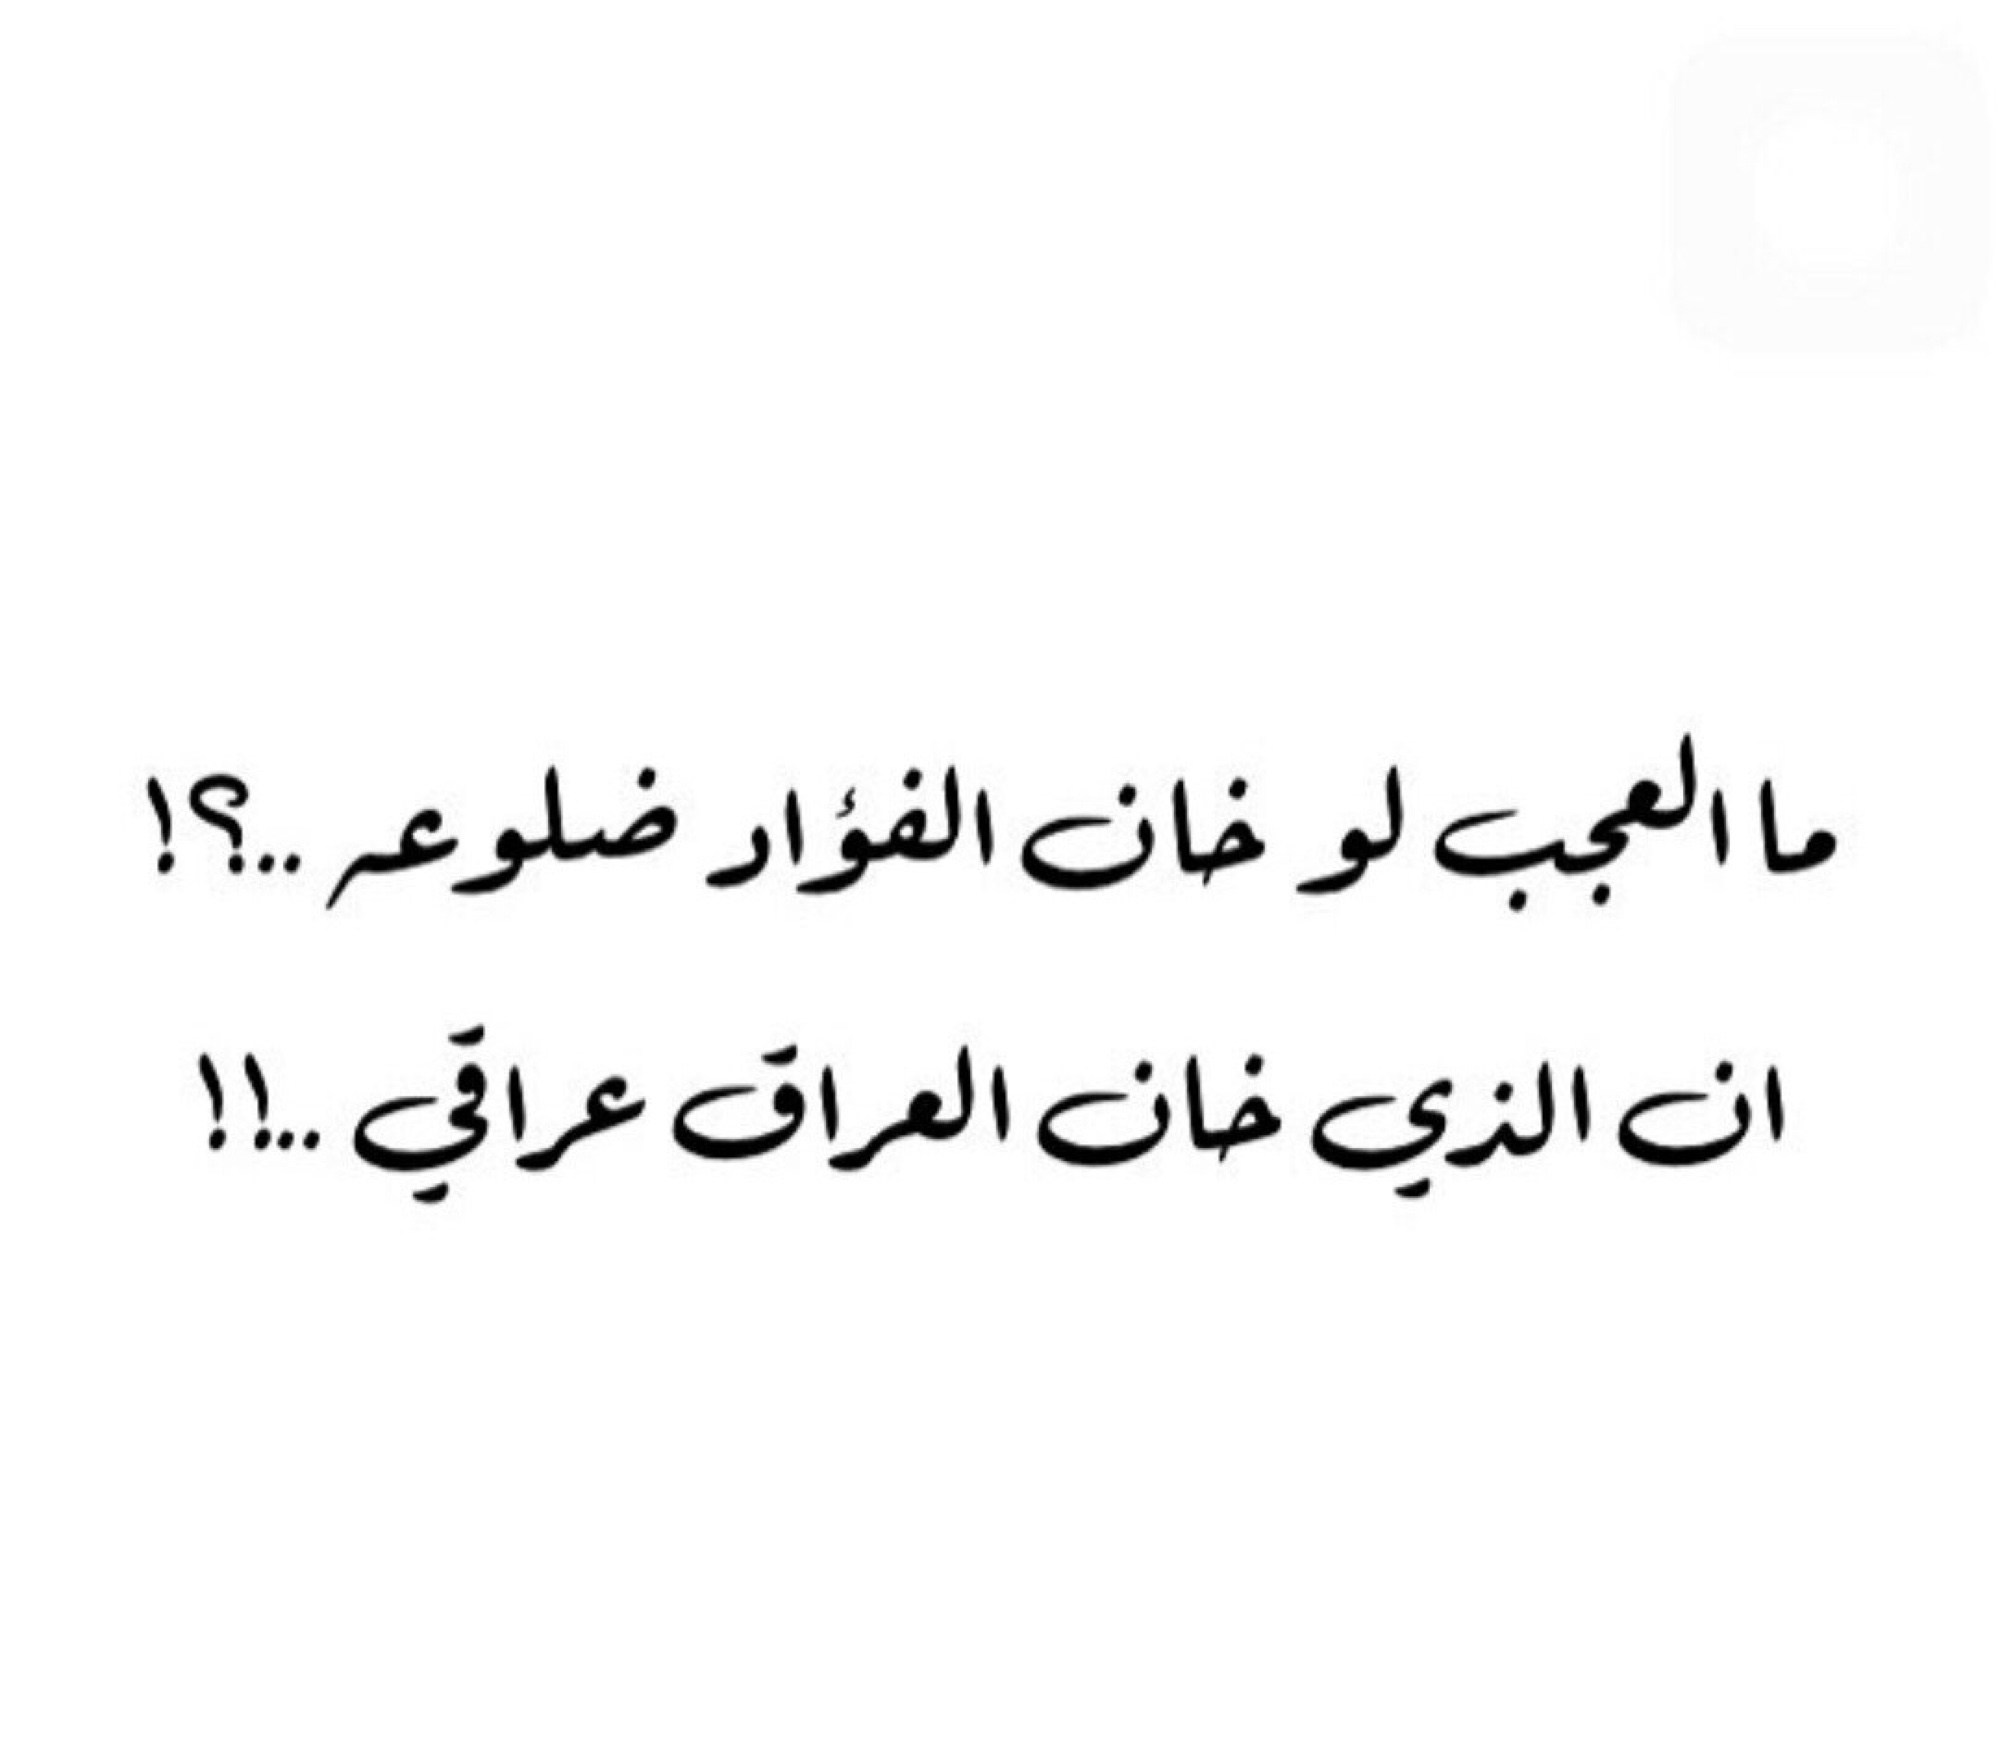 FAHDAWIE (@some1_2feel) — Likes | ASKfm